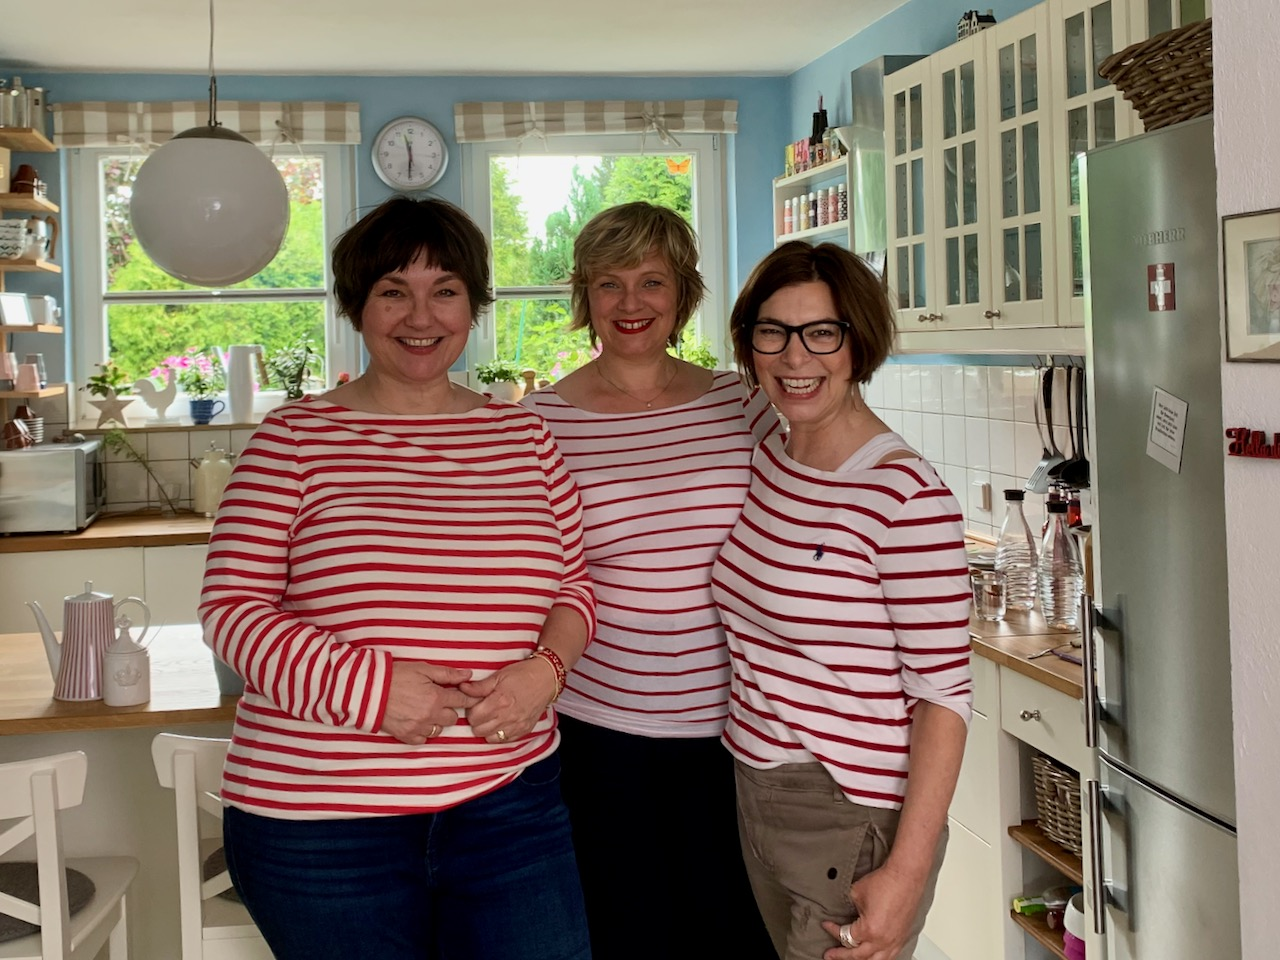 Susi, Dagmar, Martina targen rot-weiß-gestreifte Shirts. Foto: Kai Lange